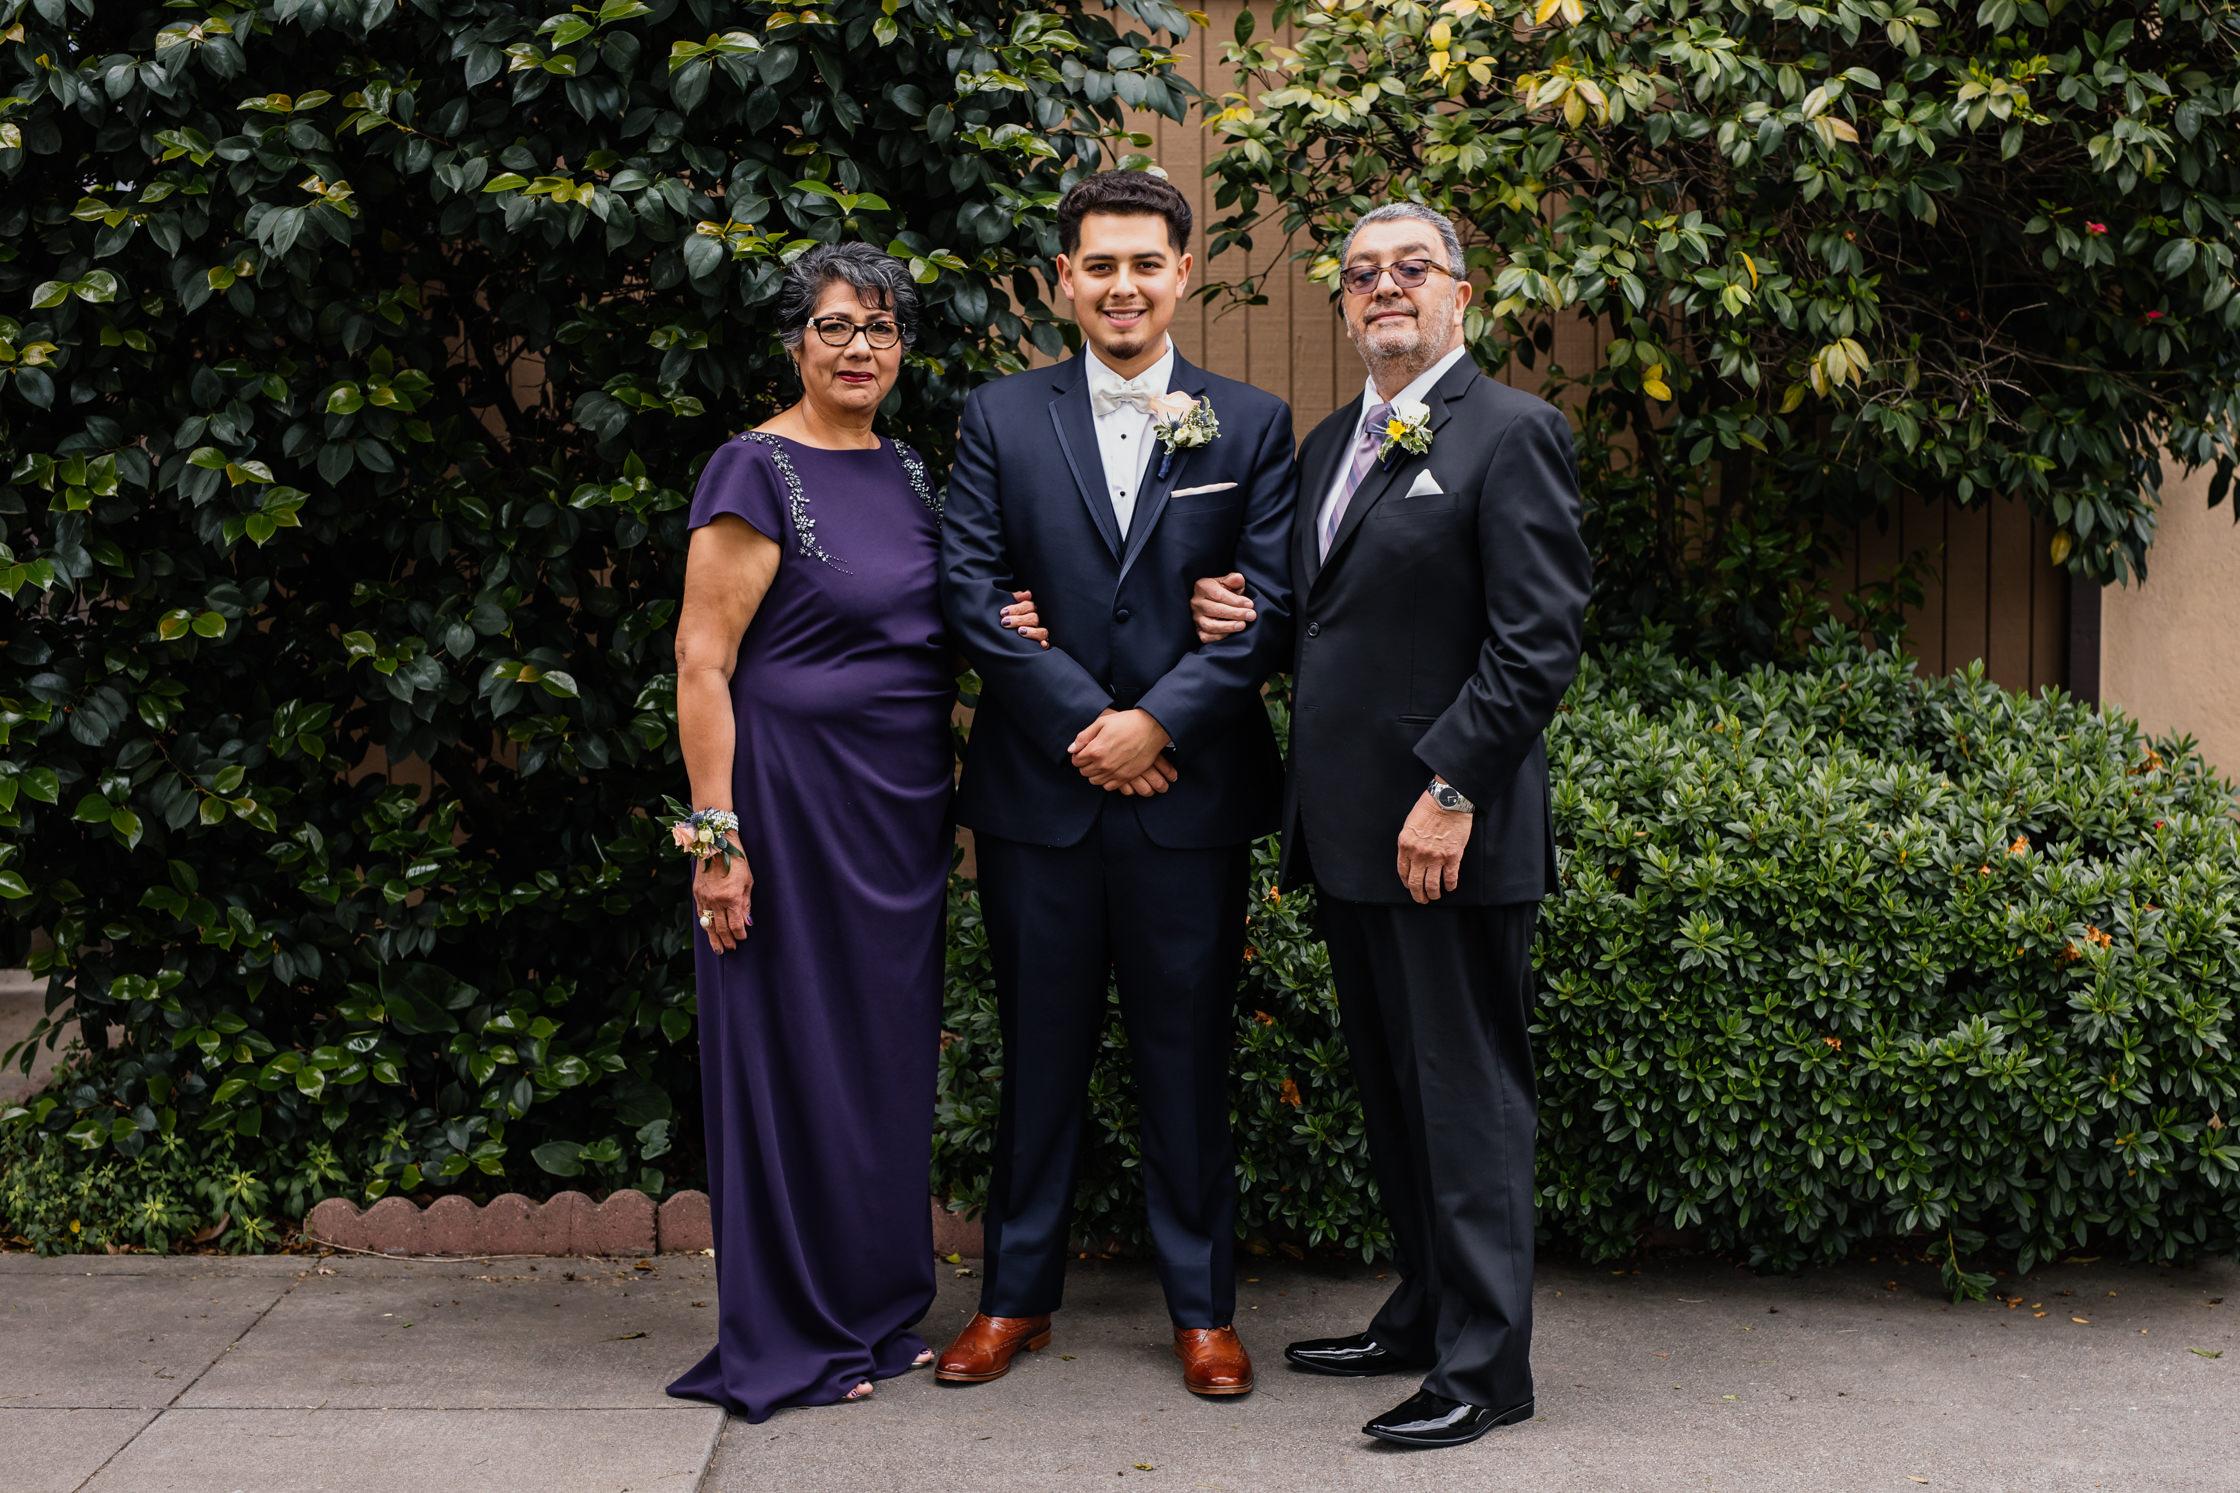 luis_joanna_wedding-4.jpg